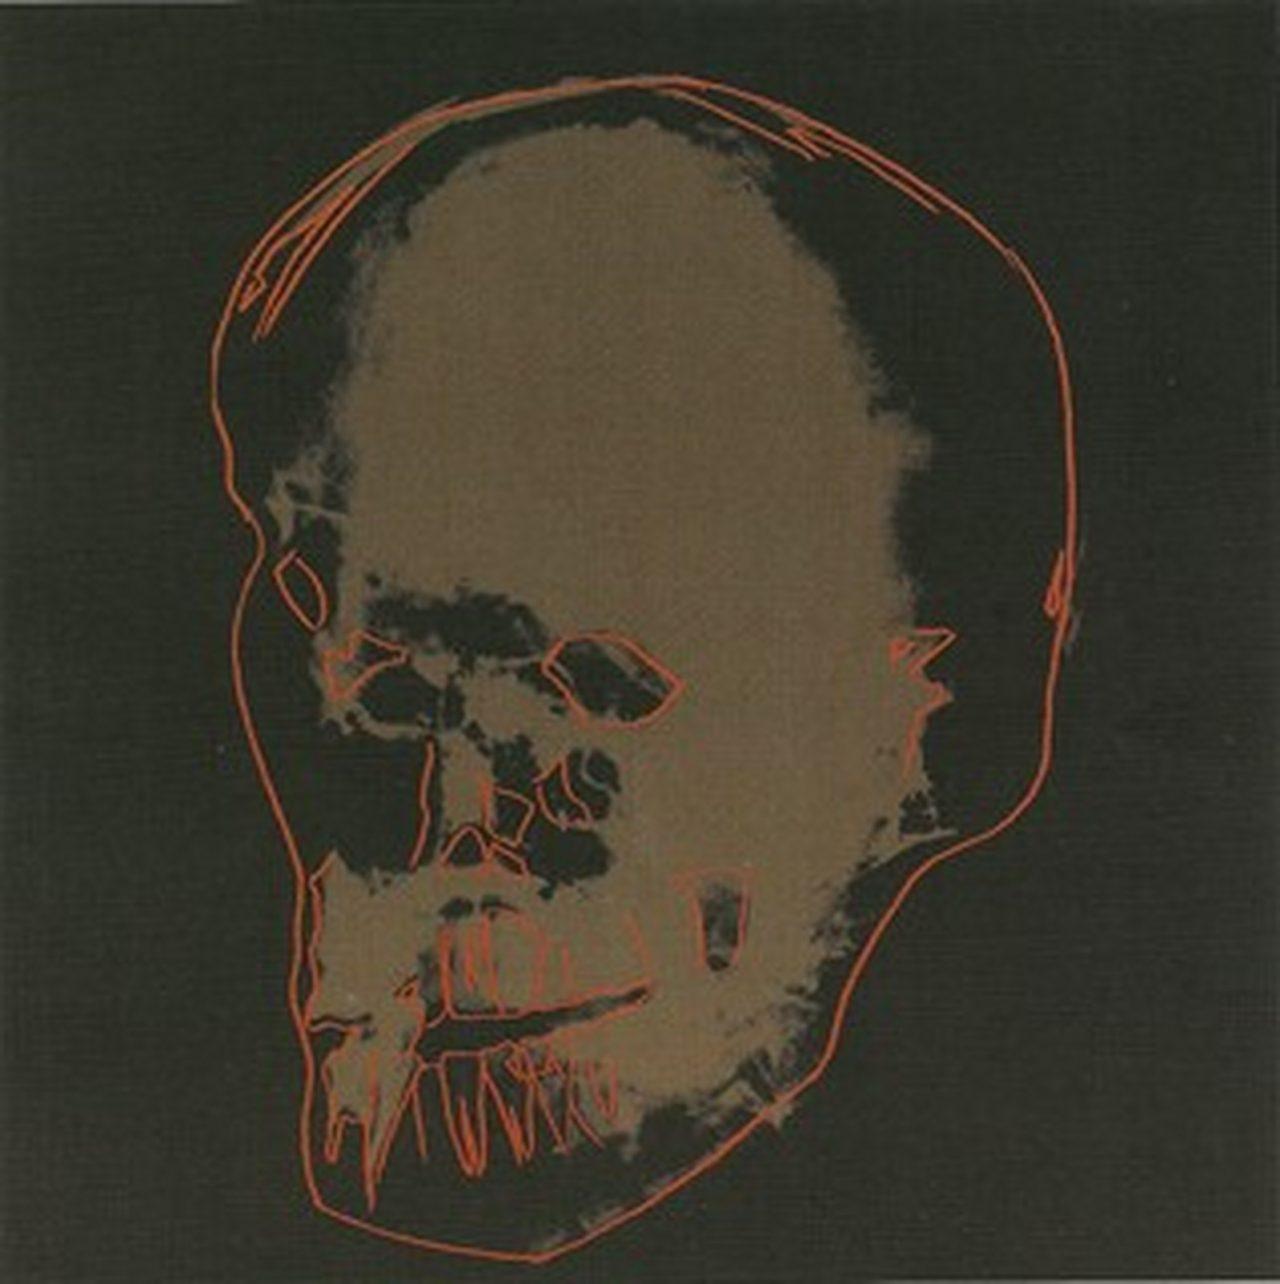 Philip Niarchos Skull